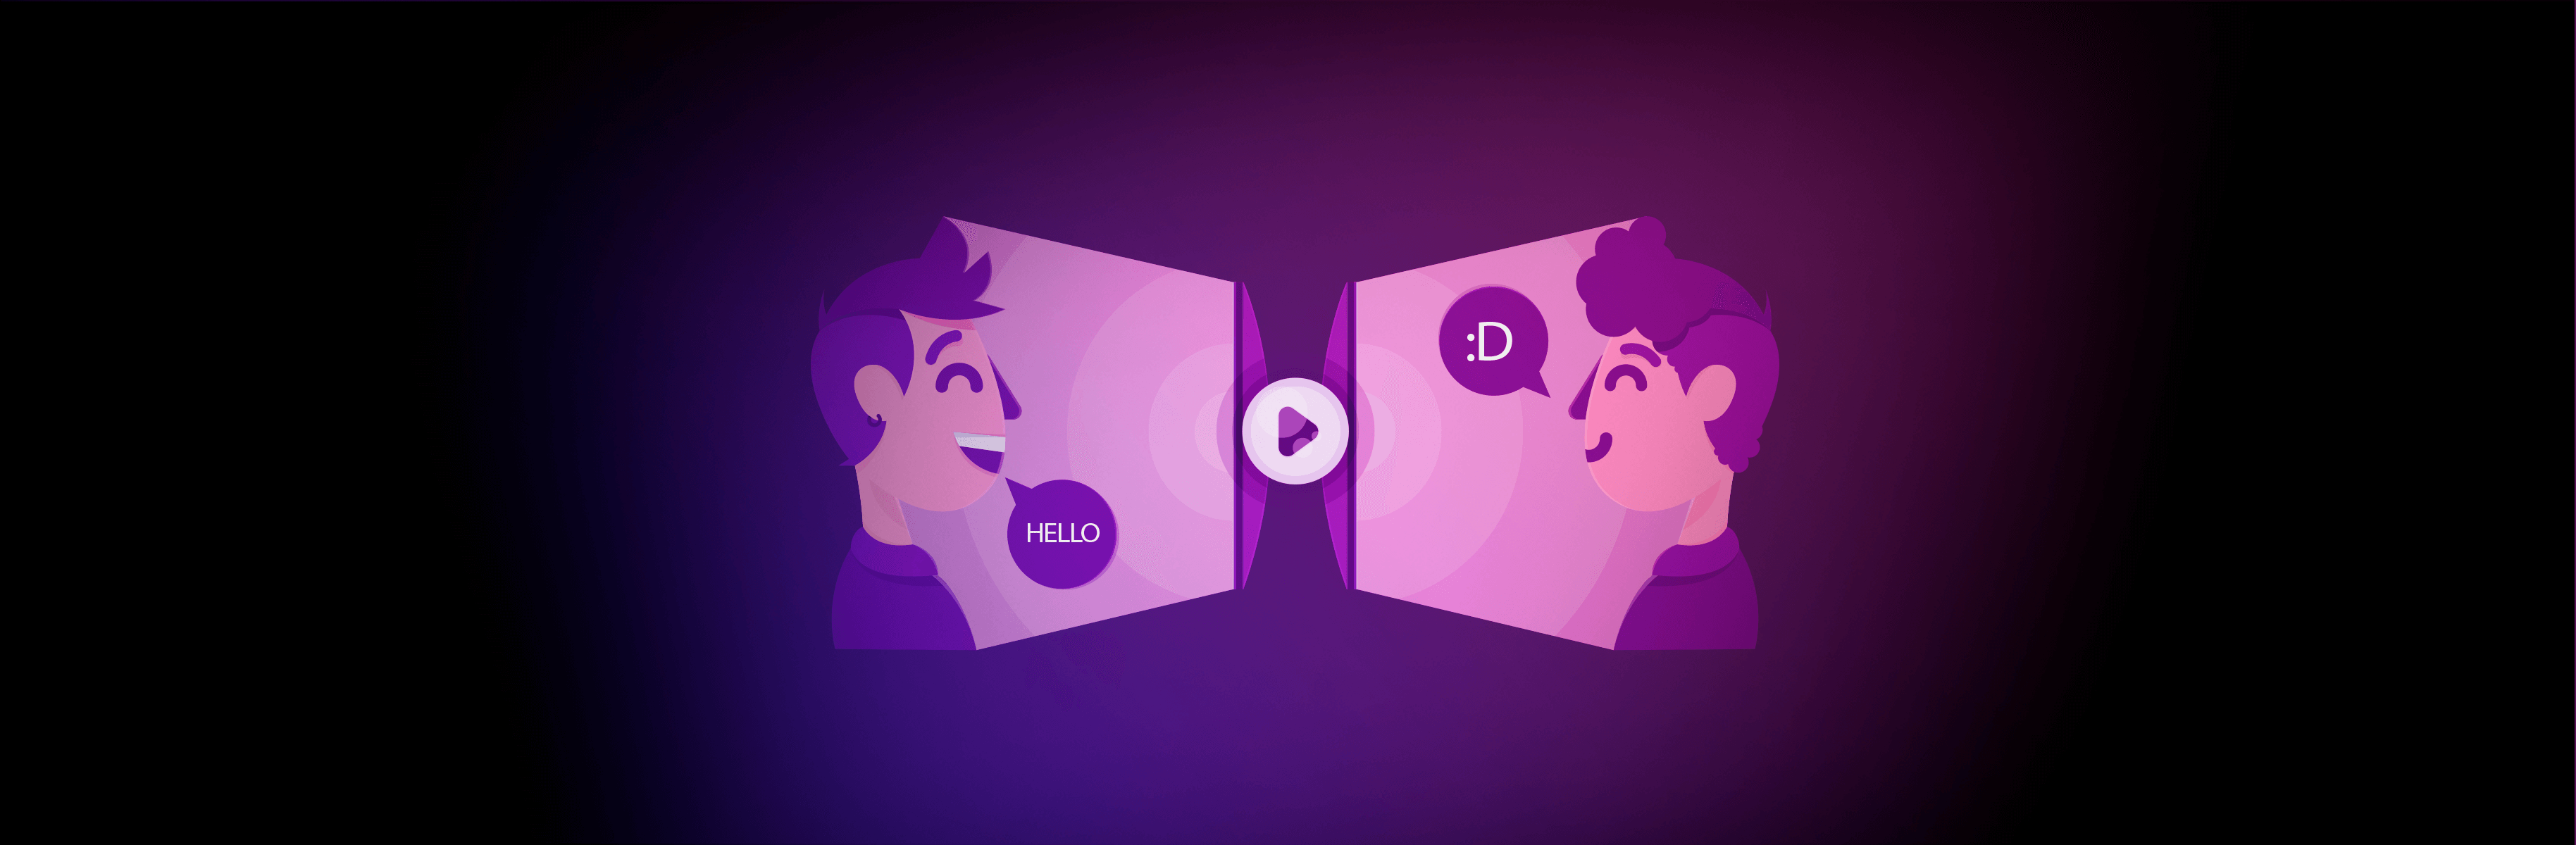 Como usar o atendimento por videochat a seu favor